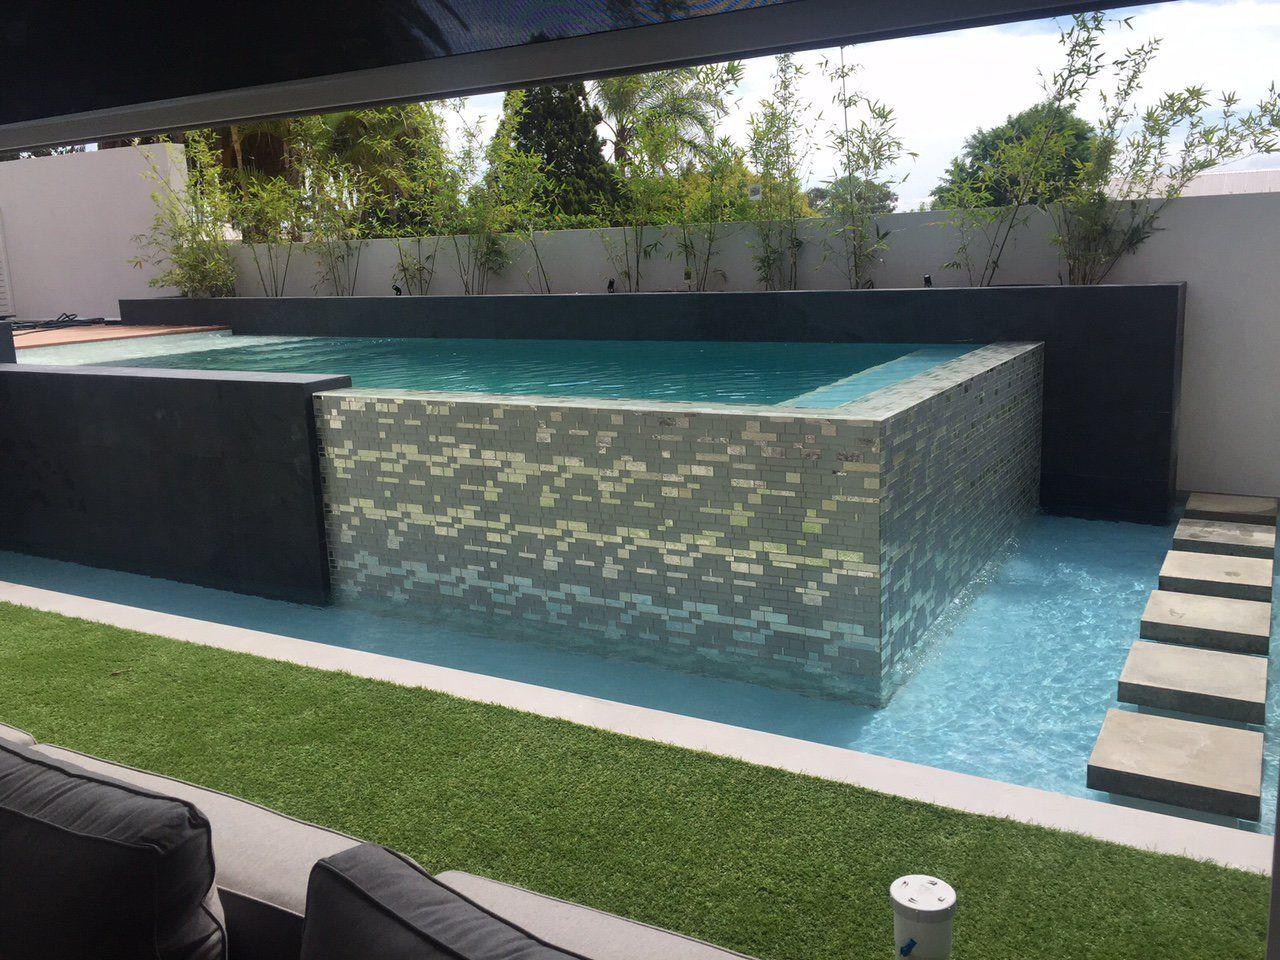 Pin by cheryl mckernan on renovation consepts concrete - Above ground concrete pool ...